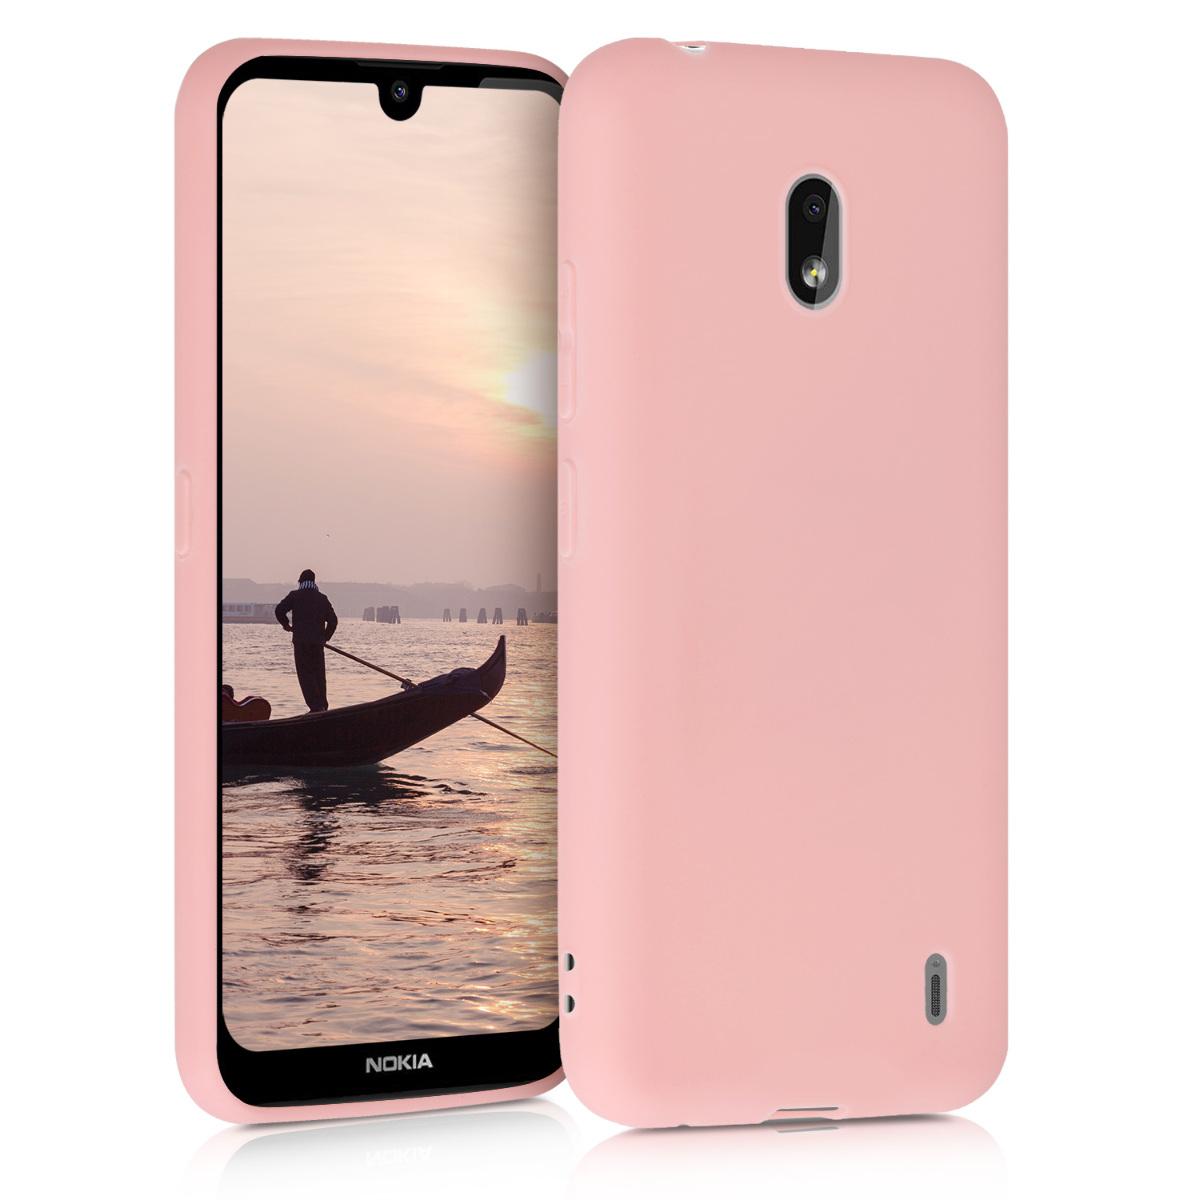 KW Θήκη Σιλικόνης Nokia 2.2 - Rose Gold Matte (51523.89)